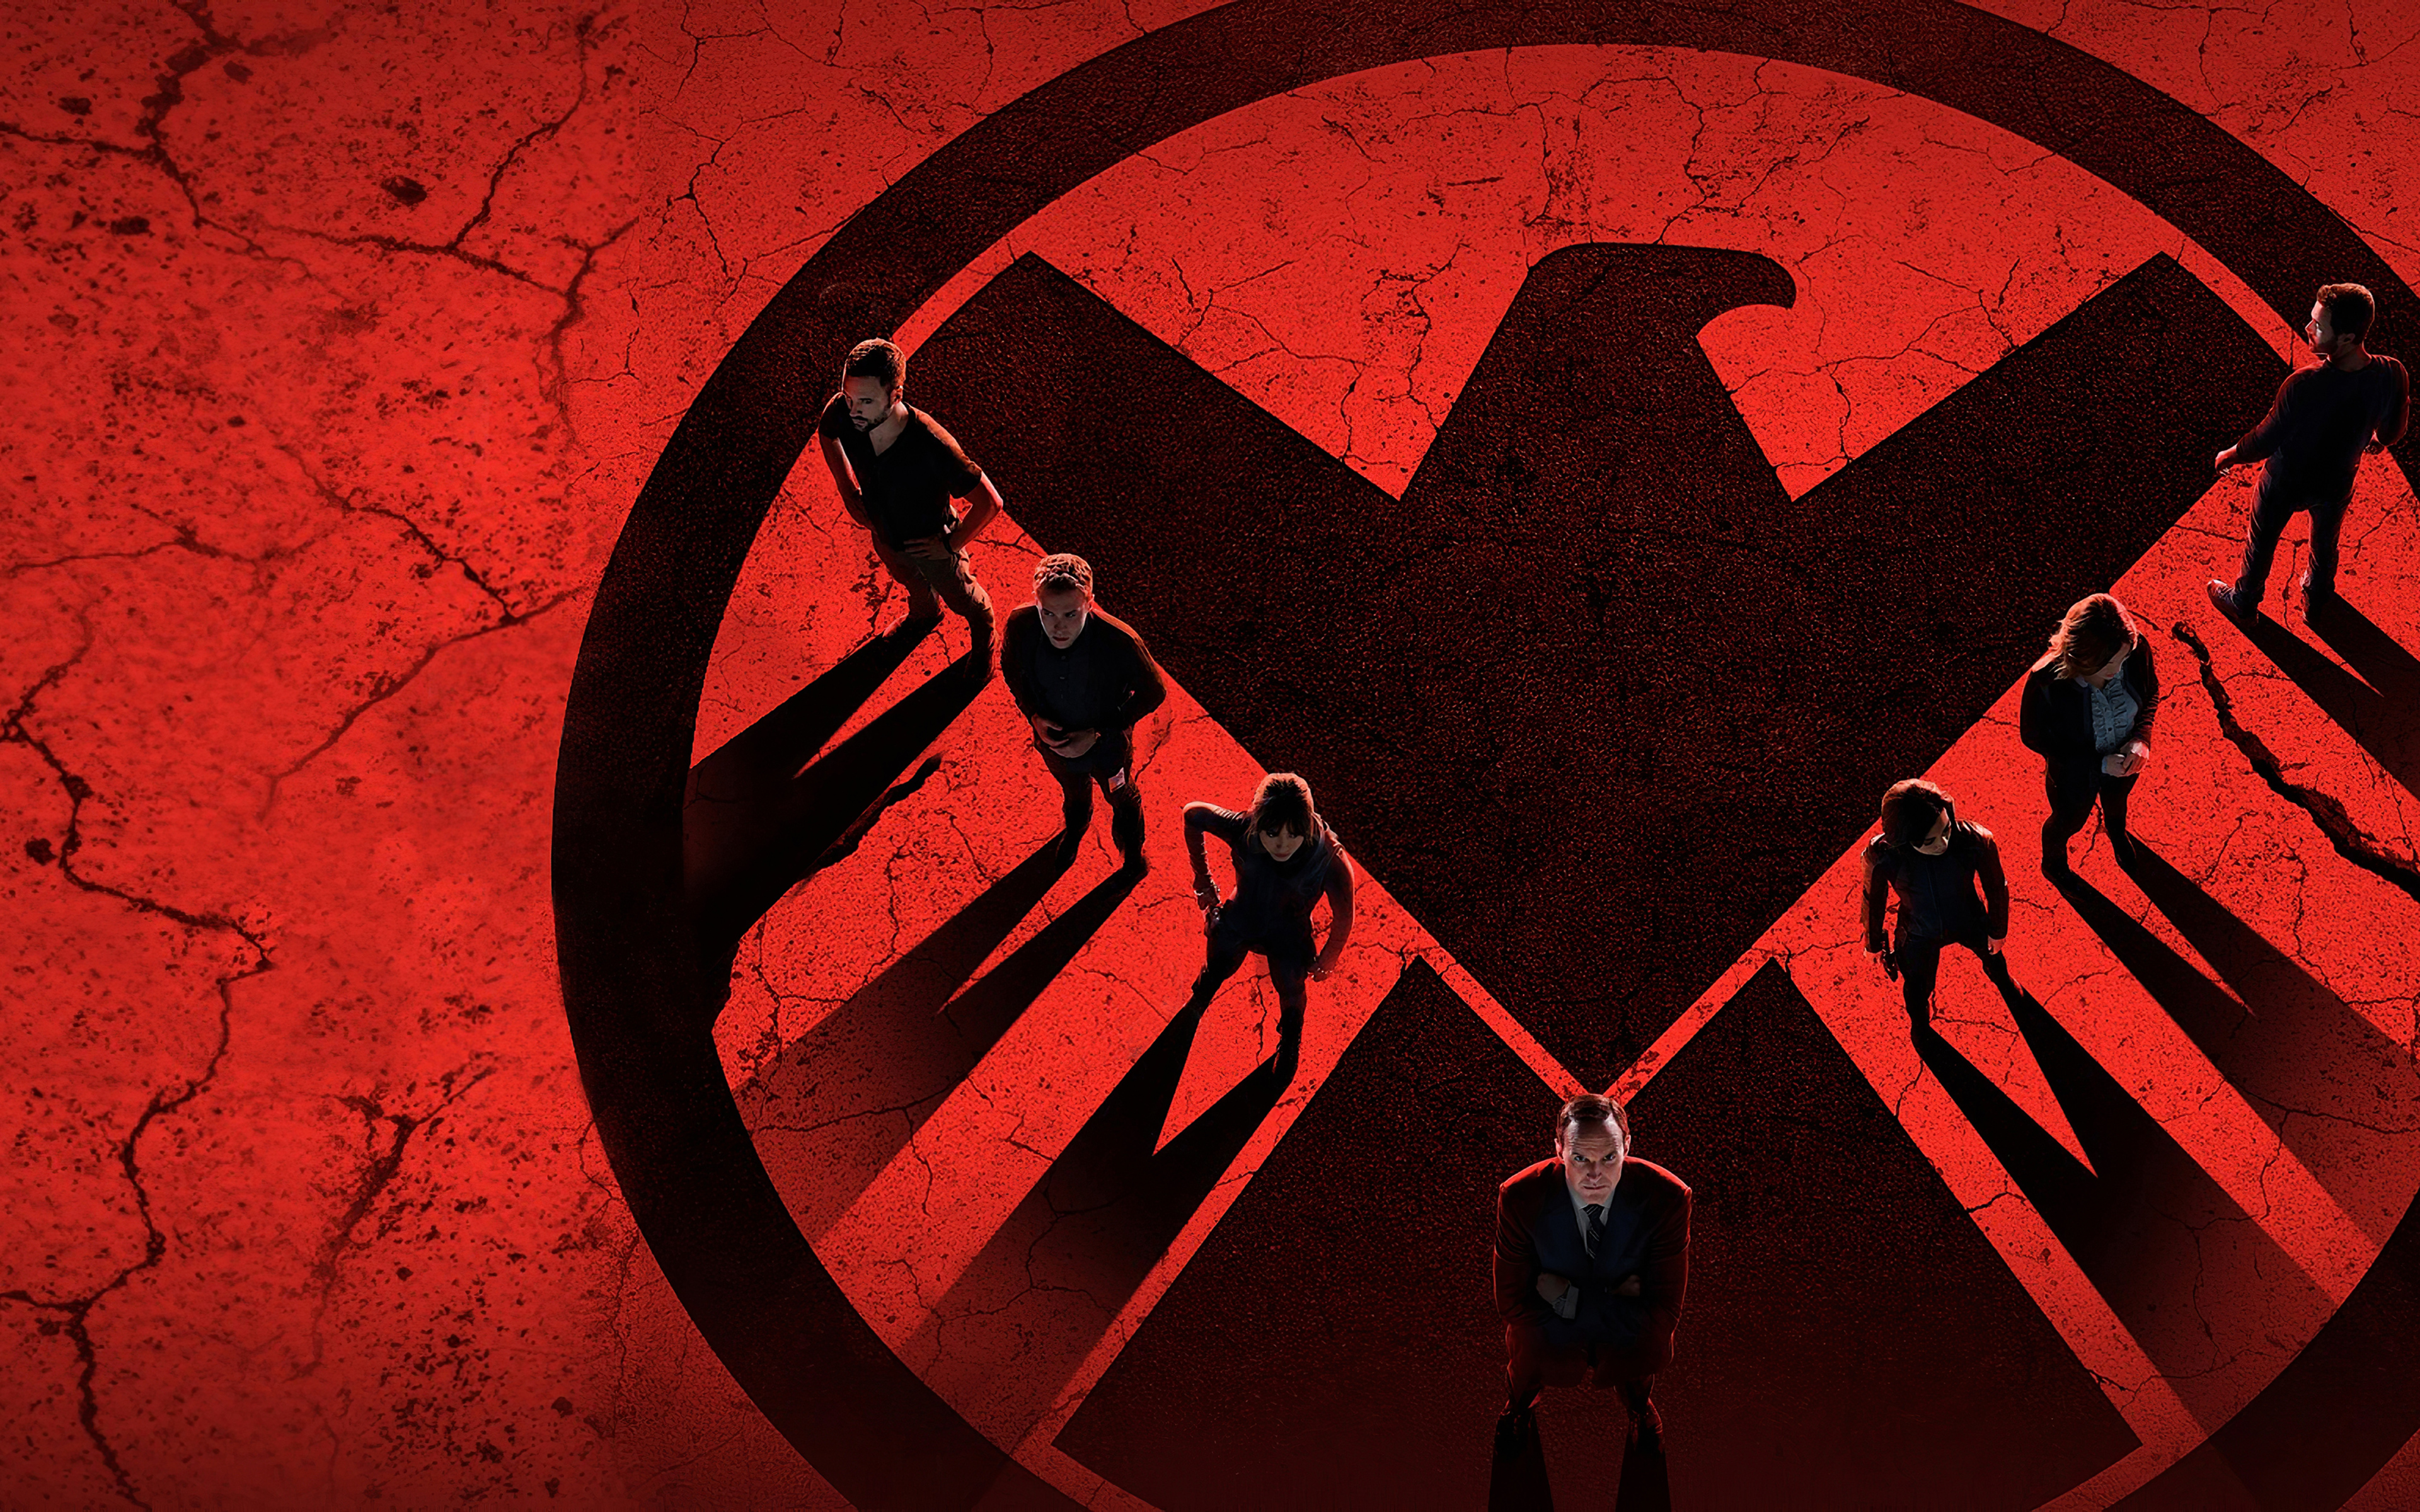 Fondos de pantalla Agents of Shield Temporada 7